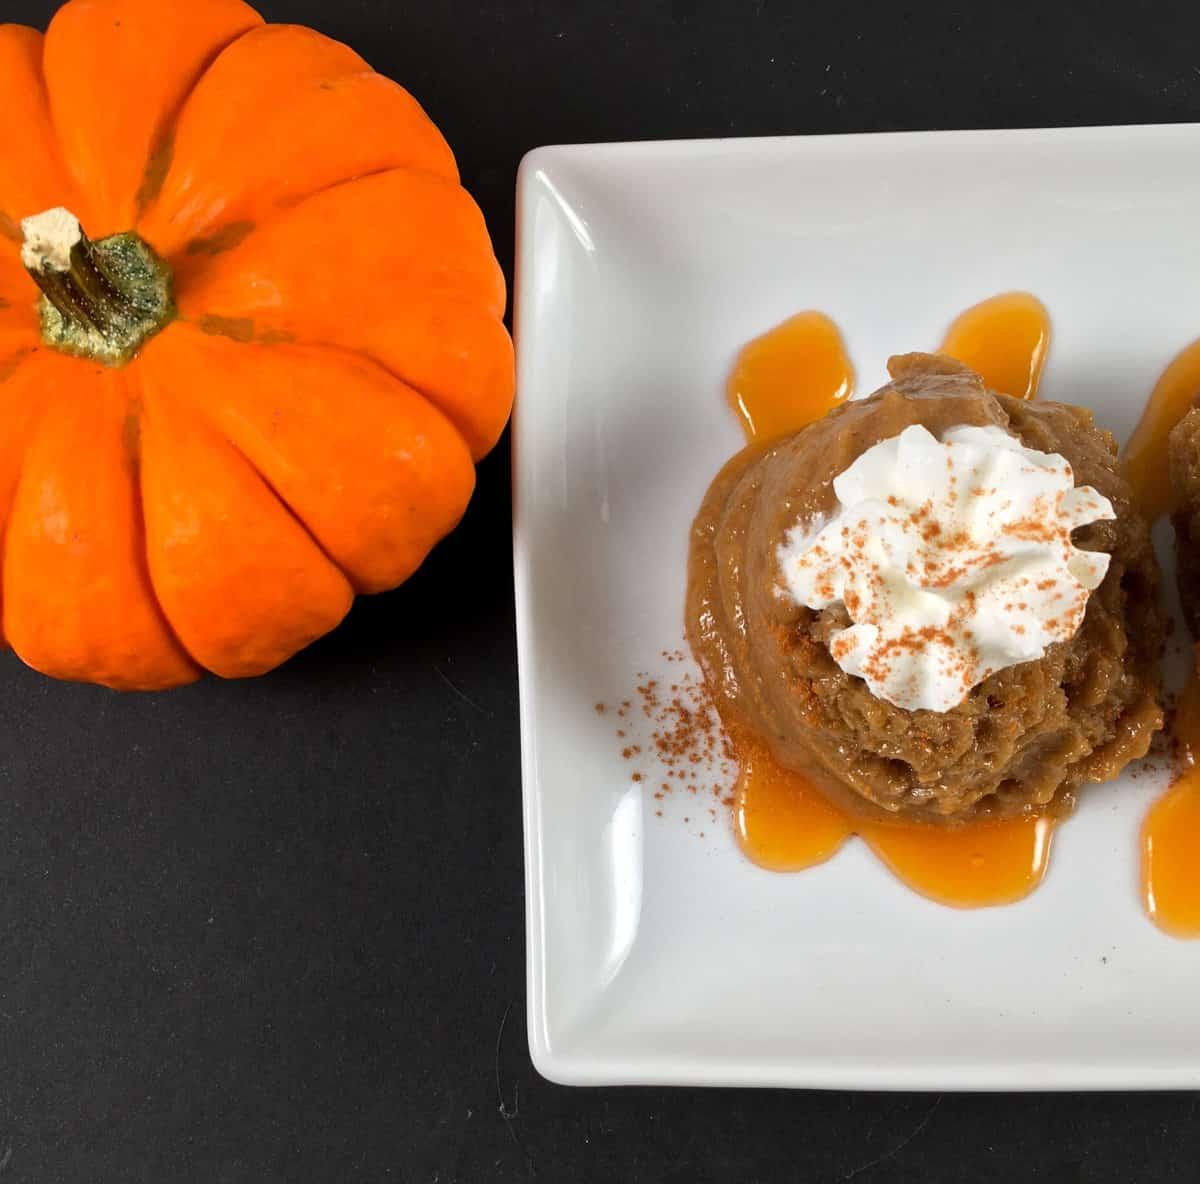 jack o lantern and dairy free pumpkin dessert